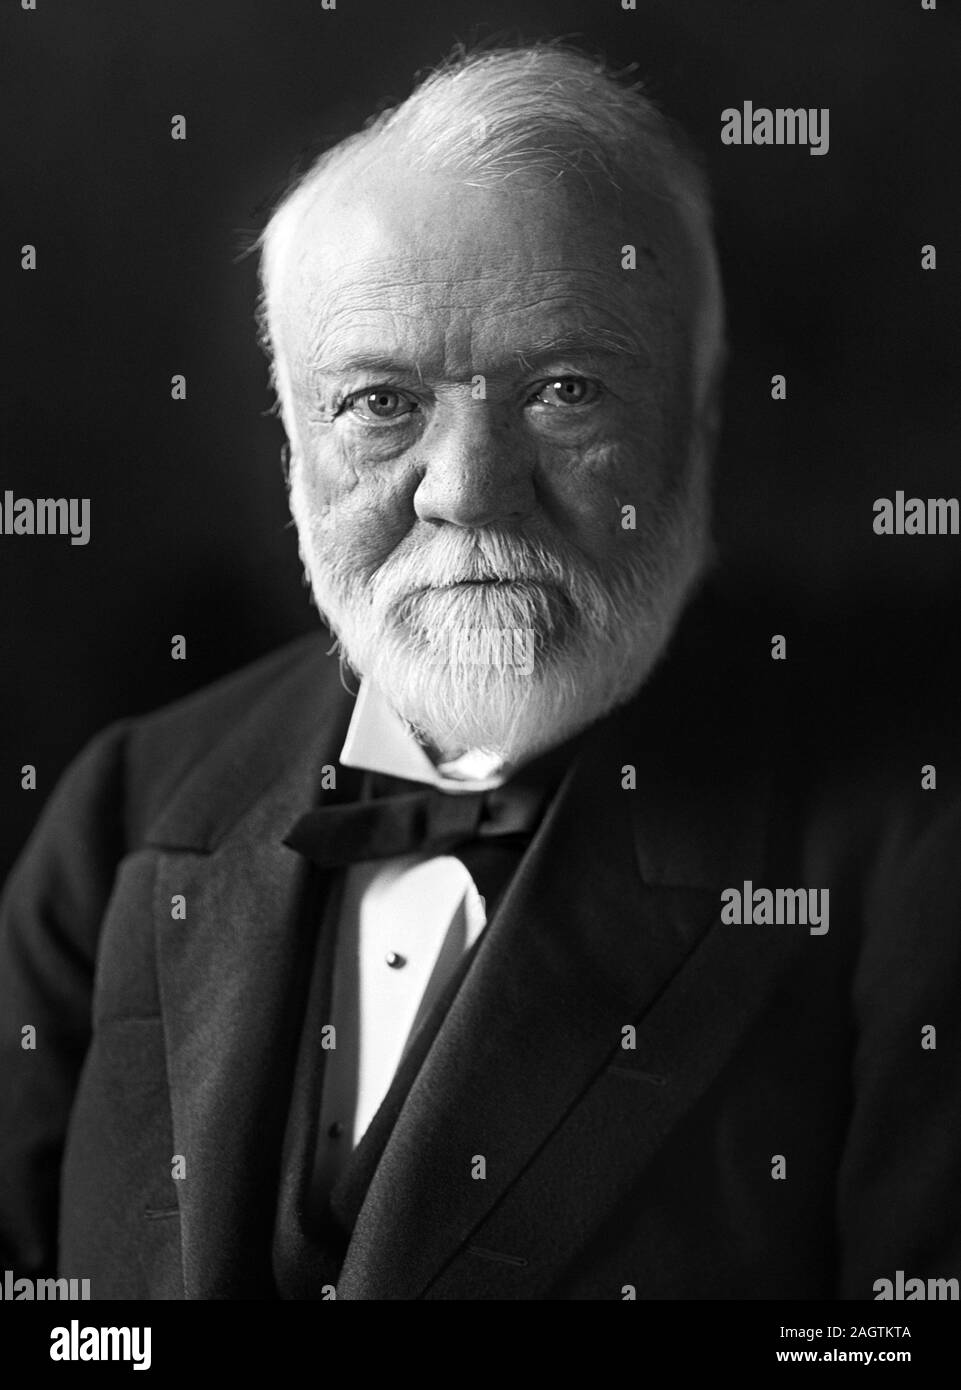 Vintage portrait photo of Scottish-American industrialist and philanthropist Andrew Carnegie (1835 – 1919). Photo circa 1910 by Harris & Ewing. Stock Photo